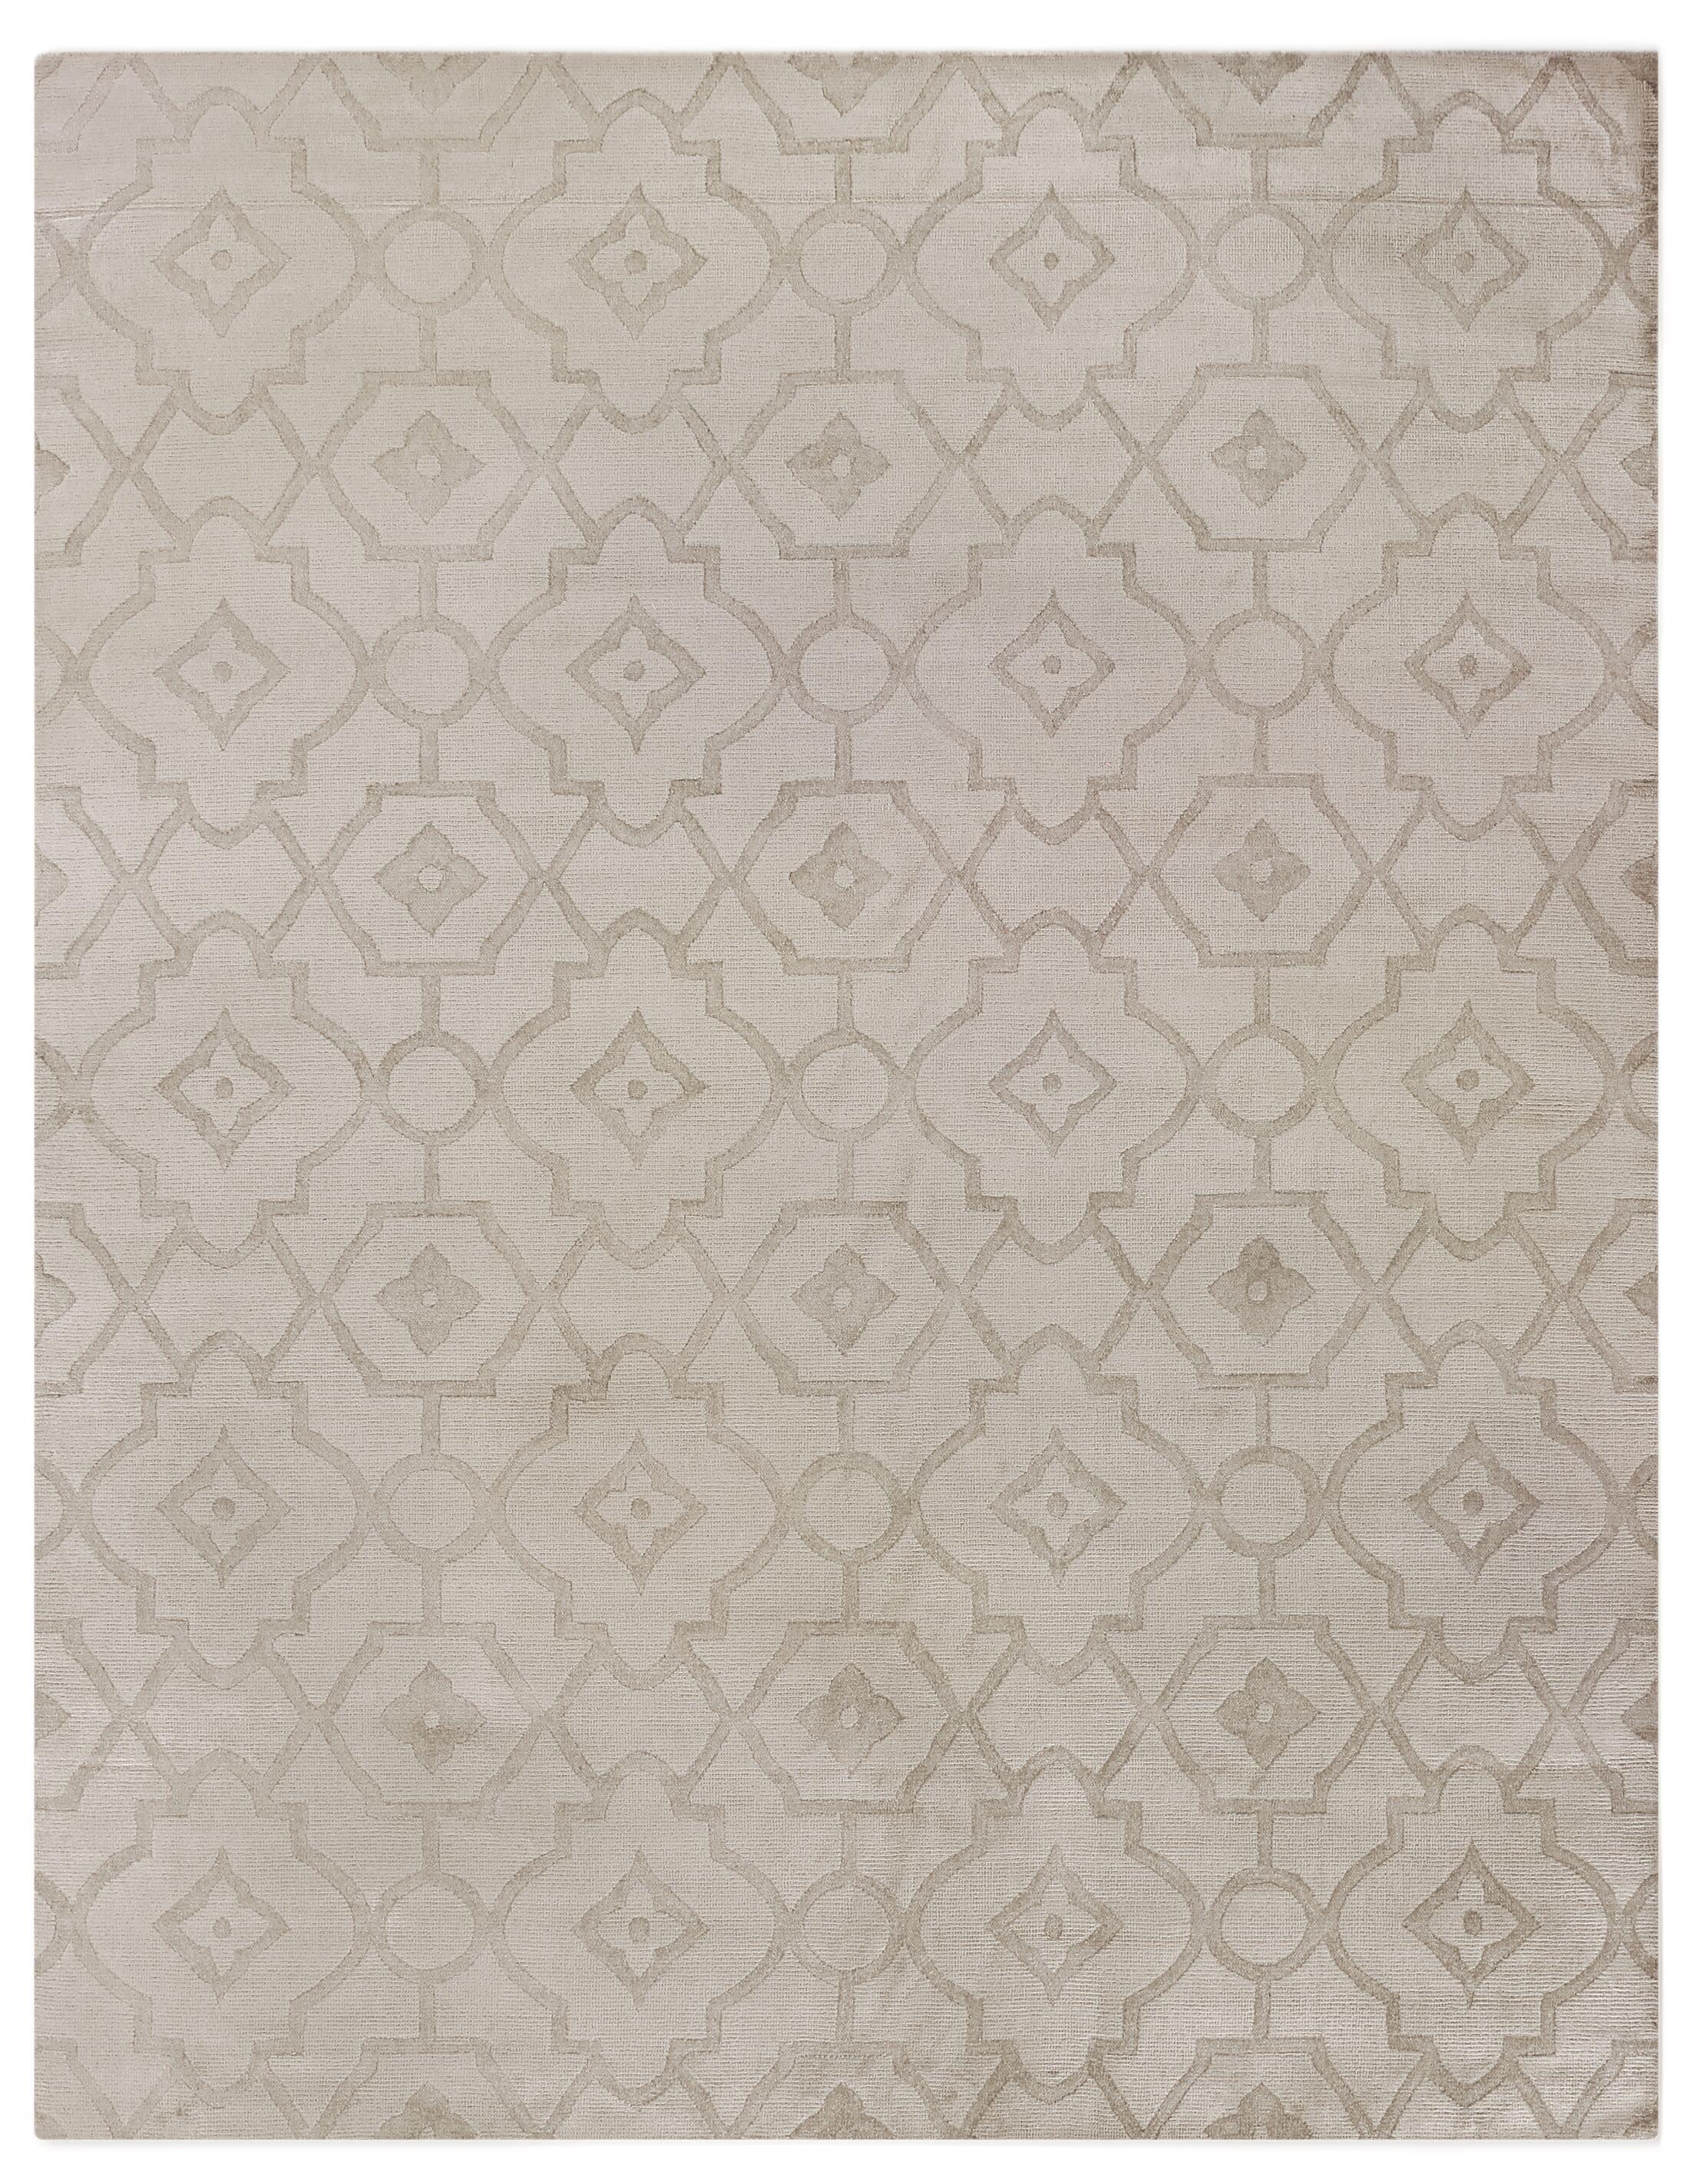 Samara Hand-Woven Light Camel Area Rug Rug Size: Rectangle 6' x 9'